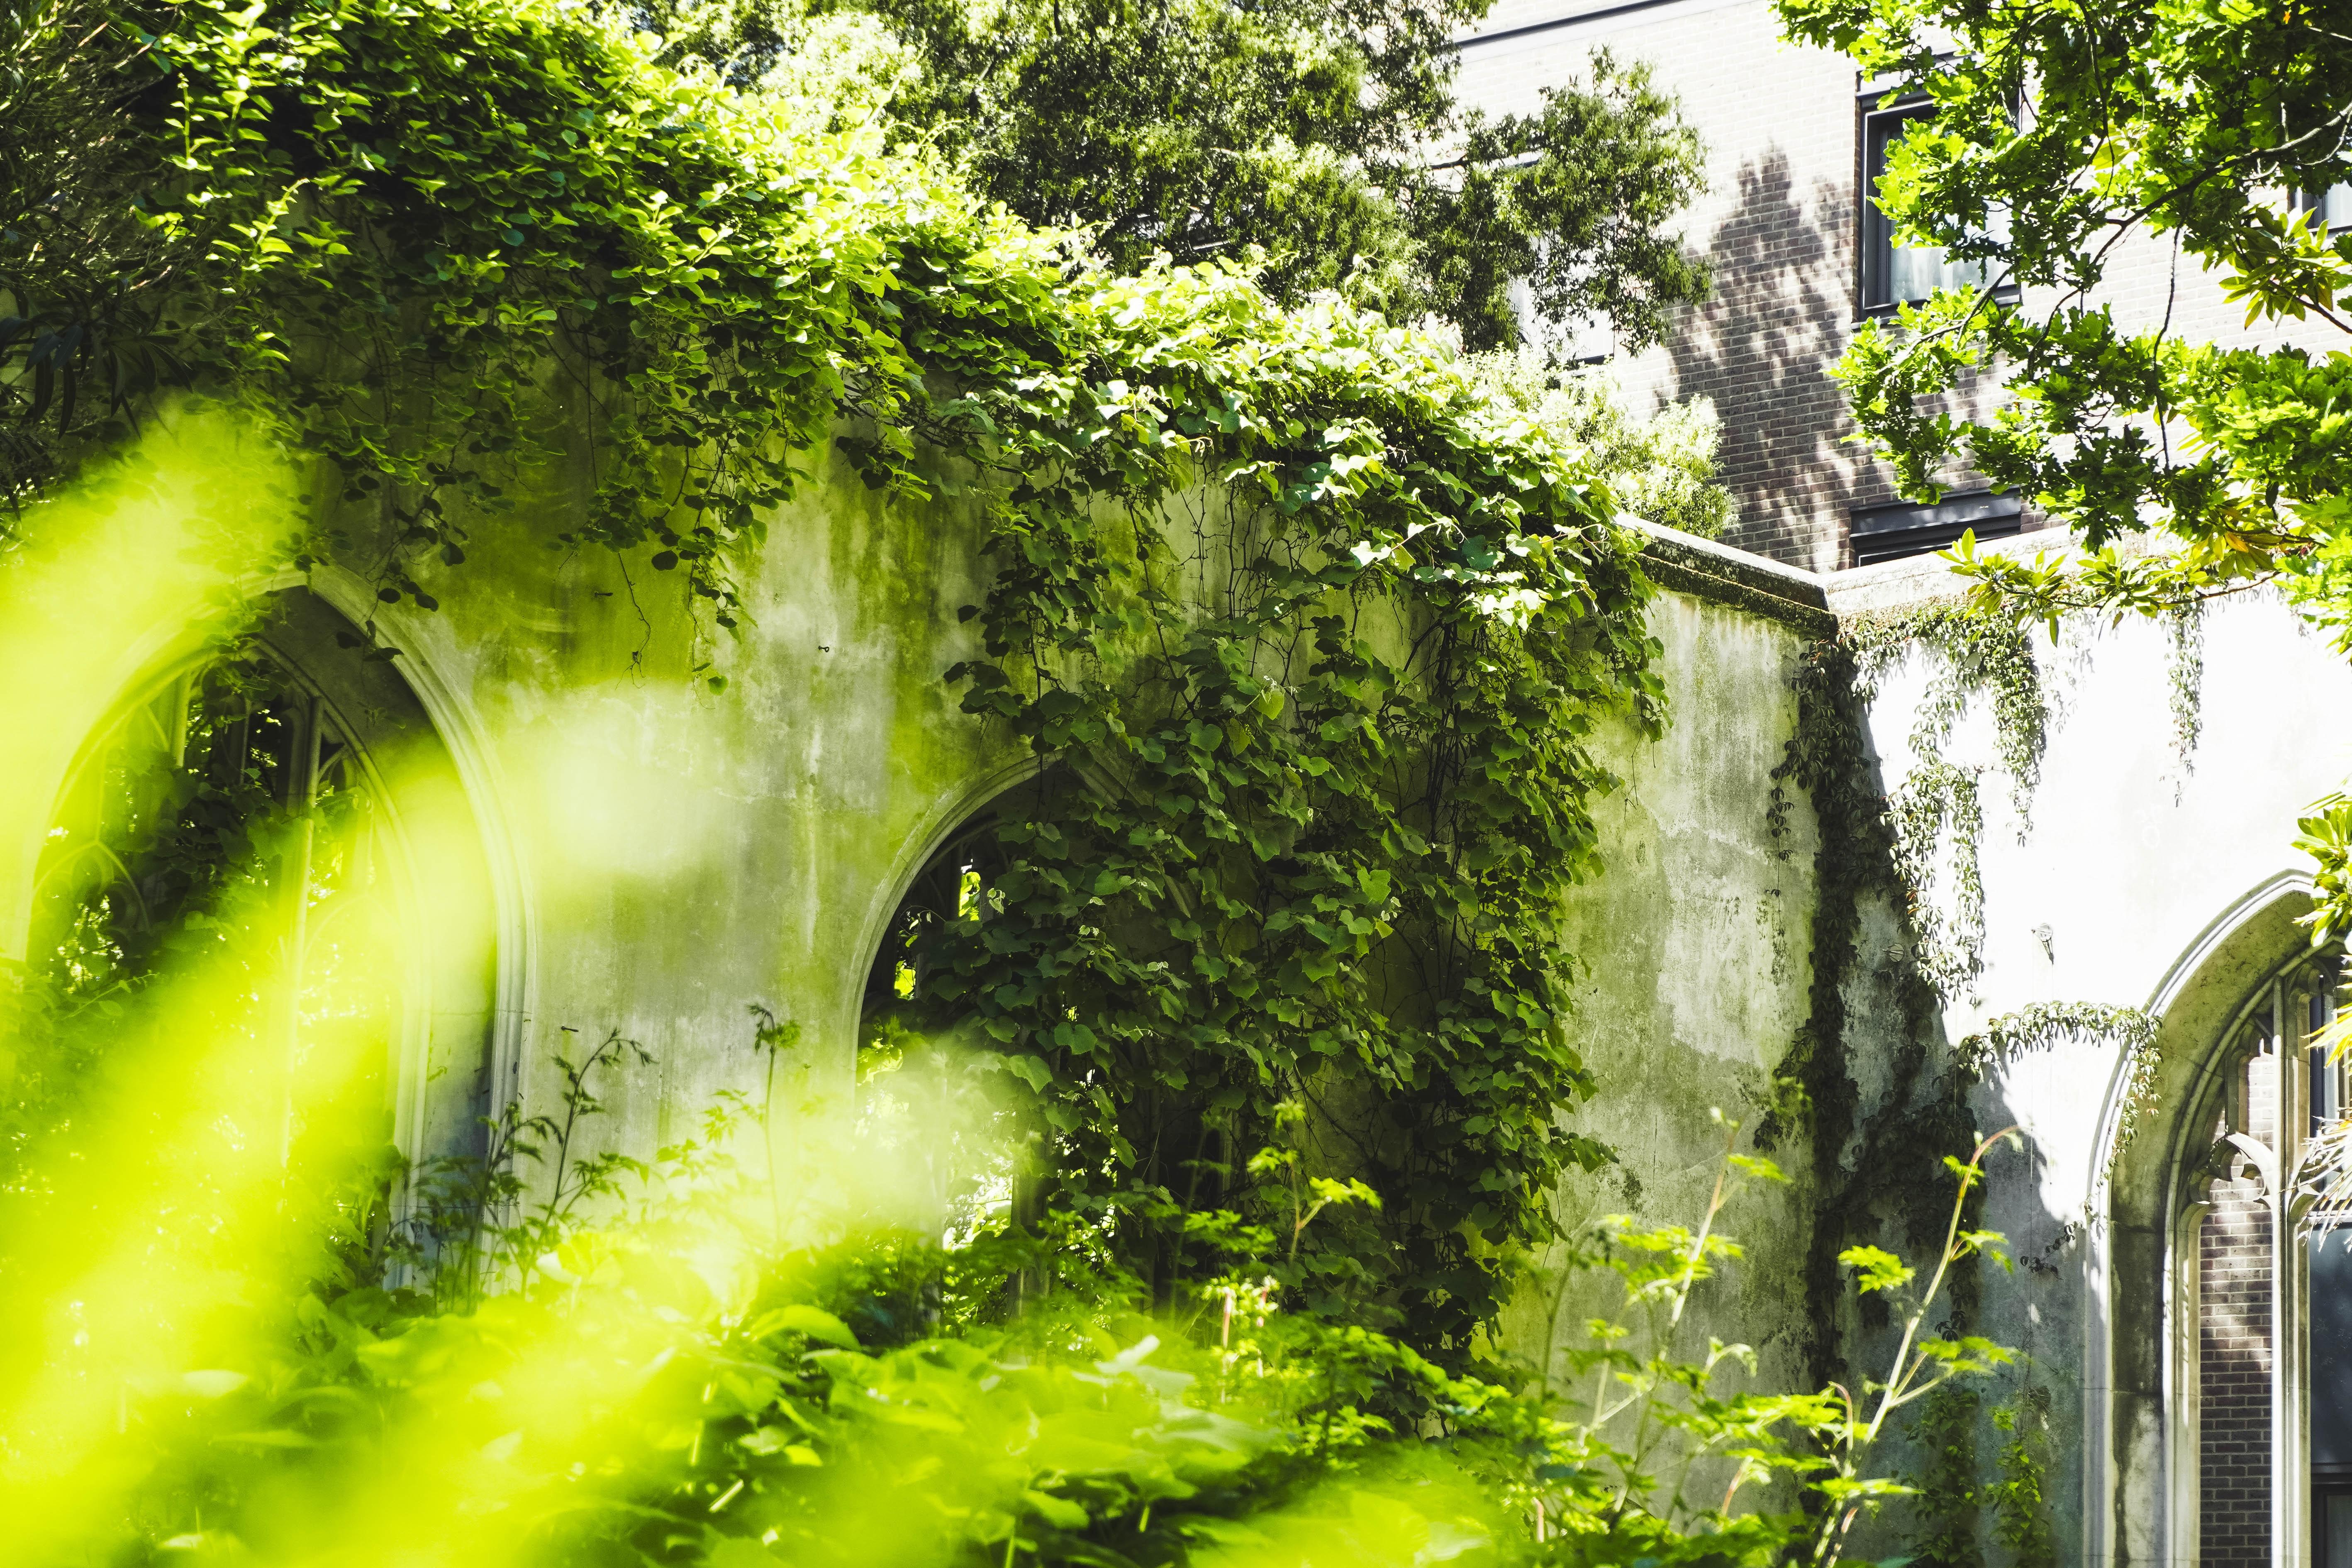 St Dunstan Gardens in London